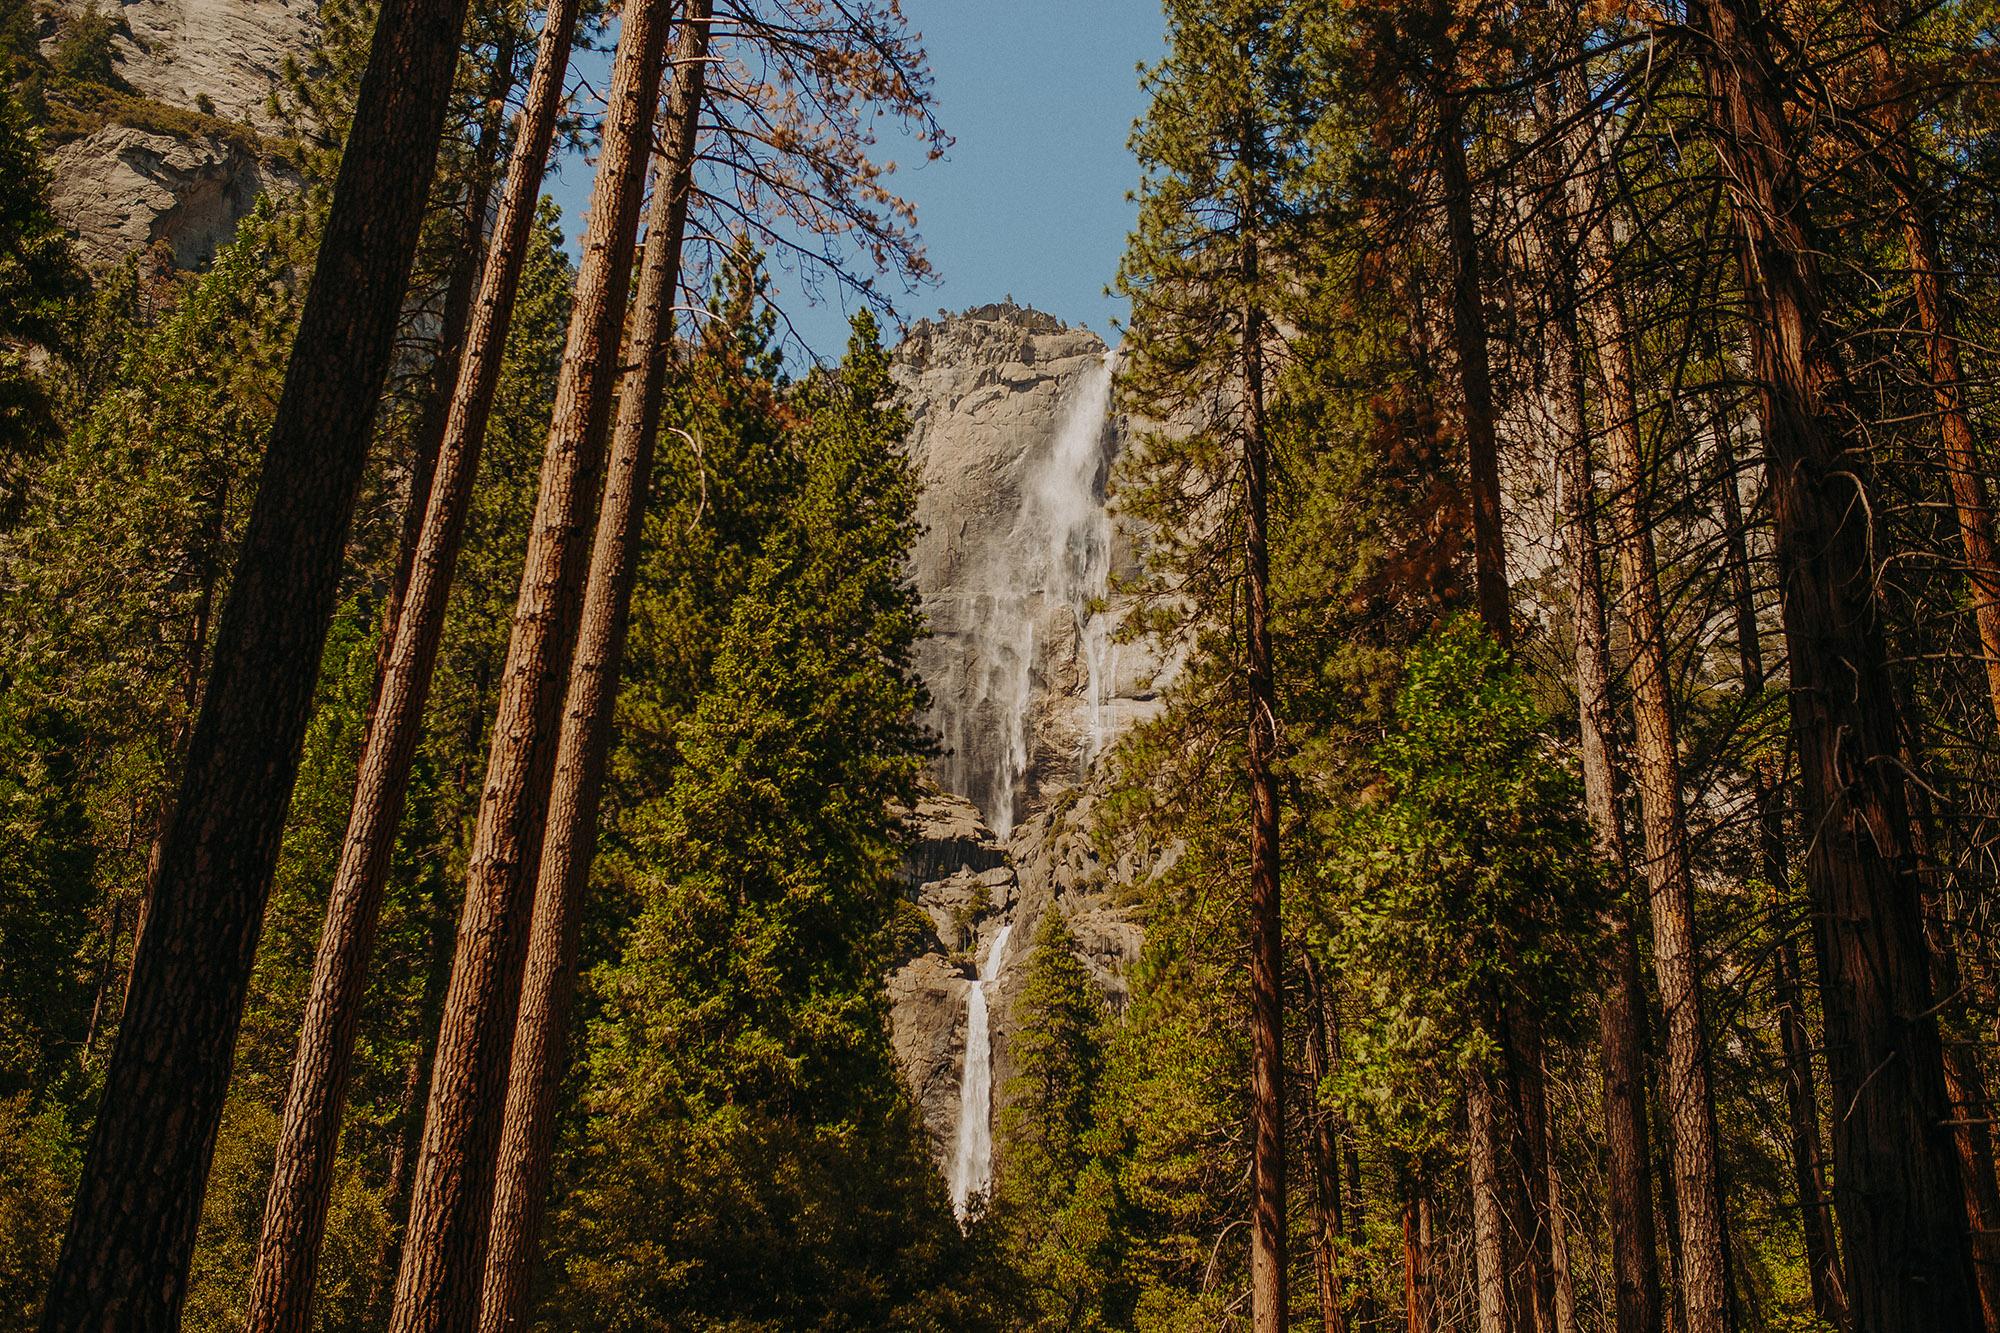 small-Visit-Yosemite-National-Park-Pictures-California-21-3.jpg